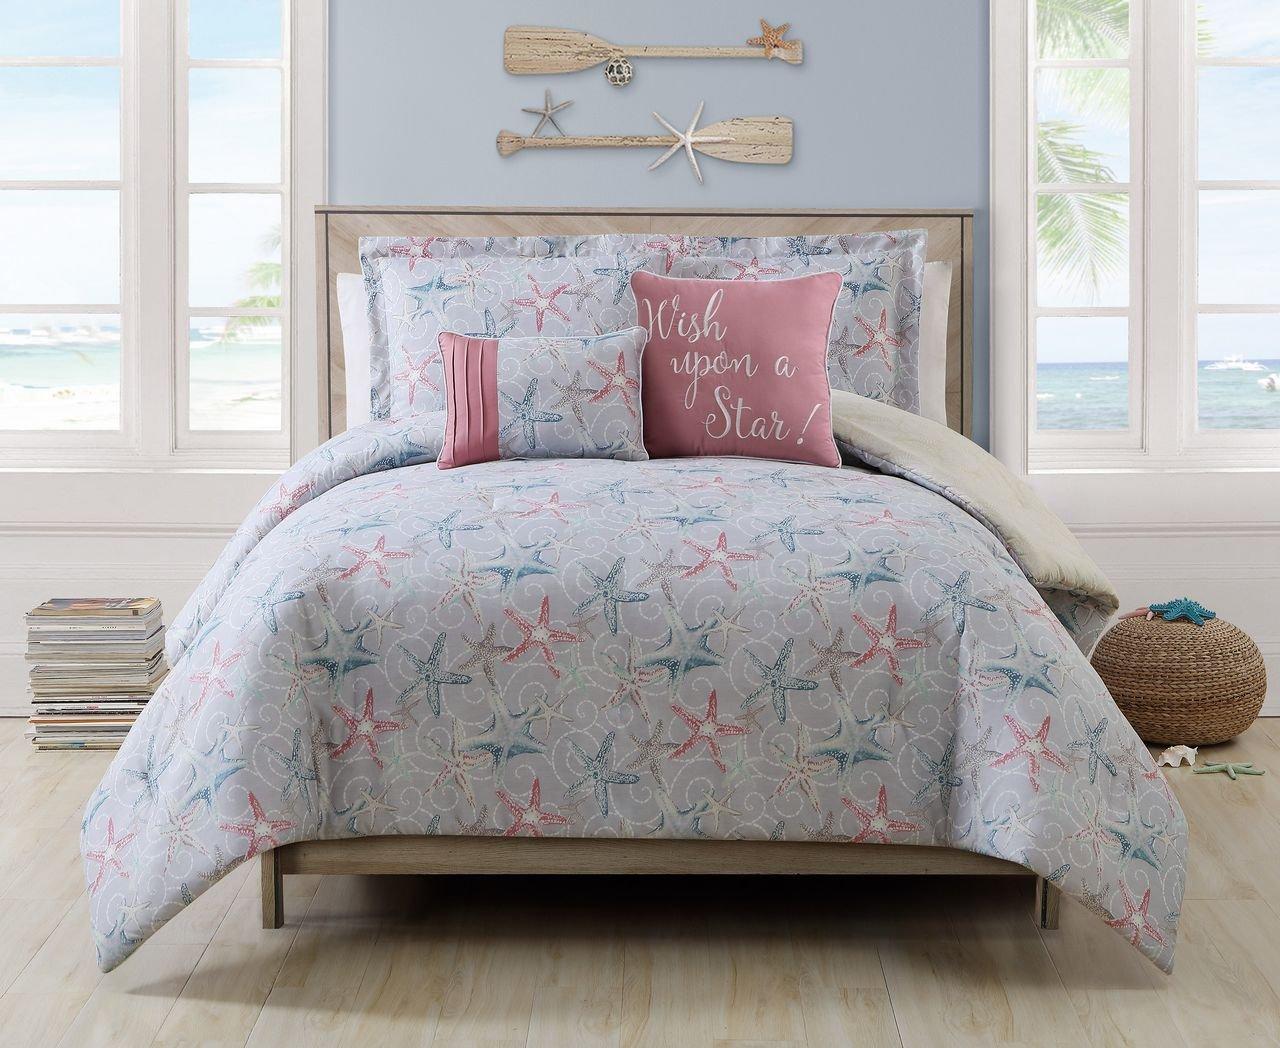 5 Piece Cabrillo Beach Gray/Ivory/Coral Reversible Comforter Set Queen